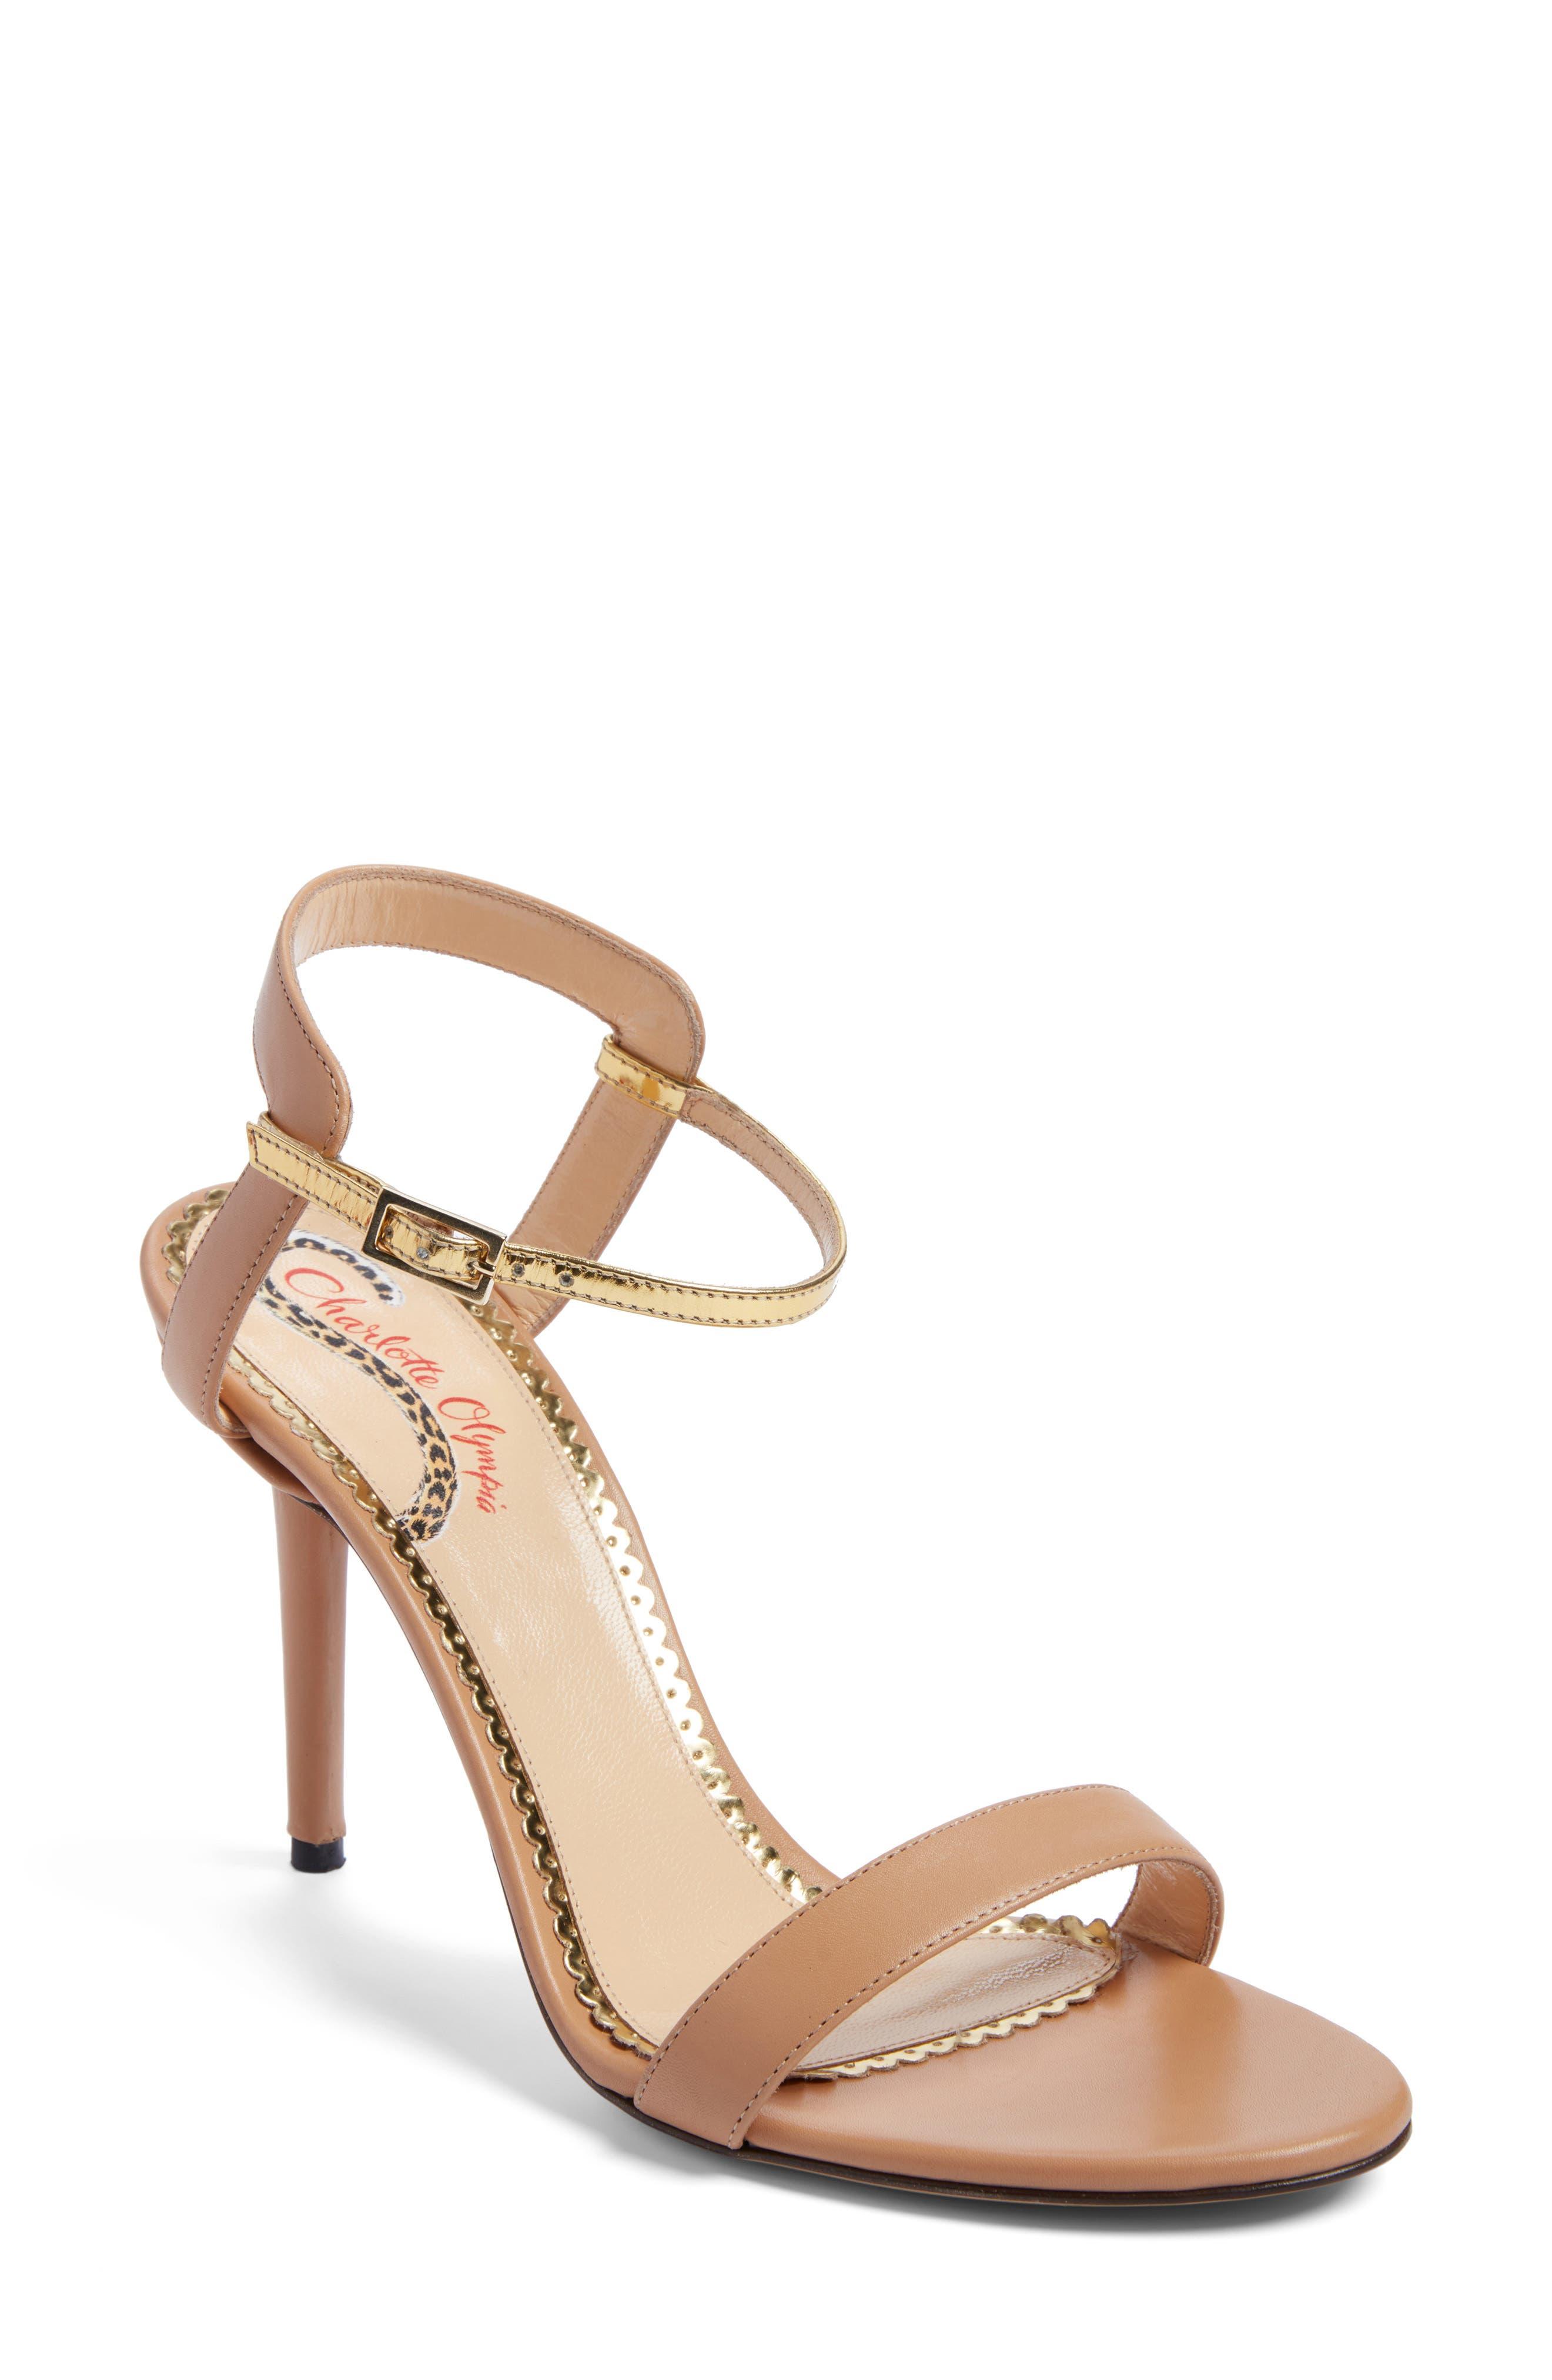 Charlotte Olympia Quintessential Sandal (Women)